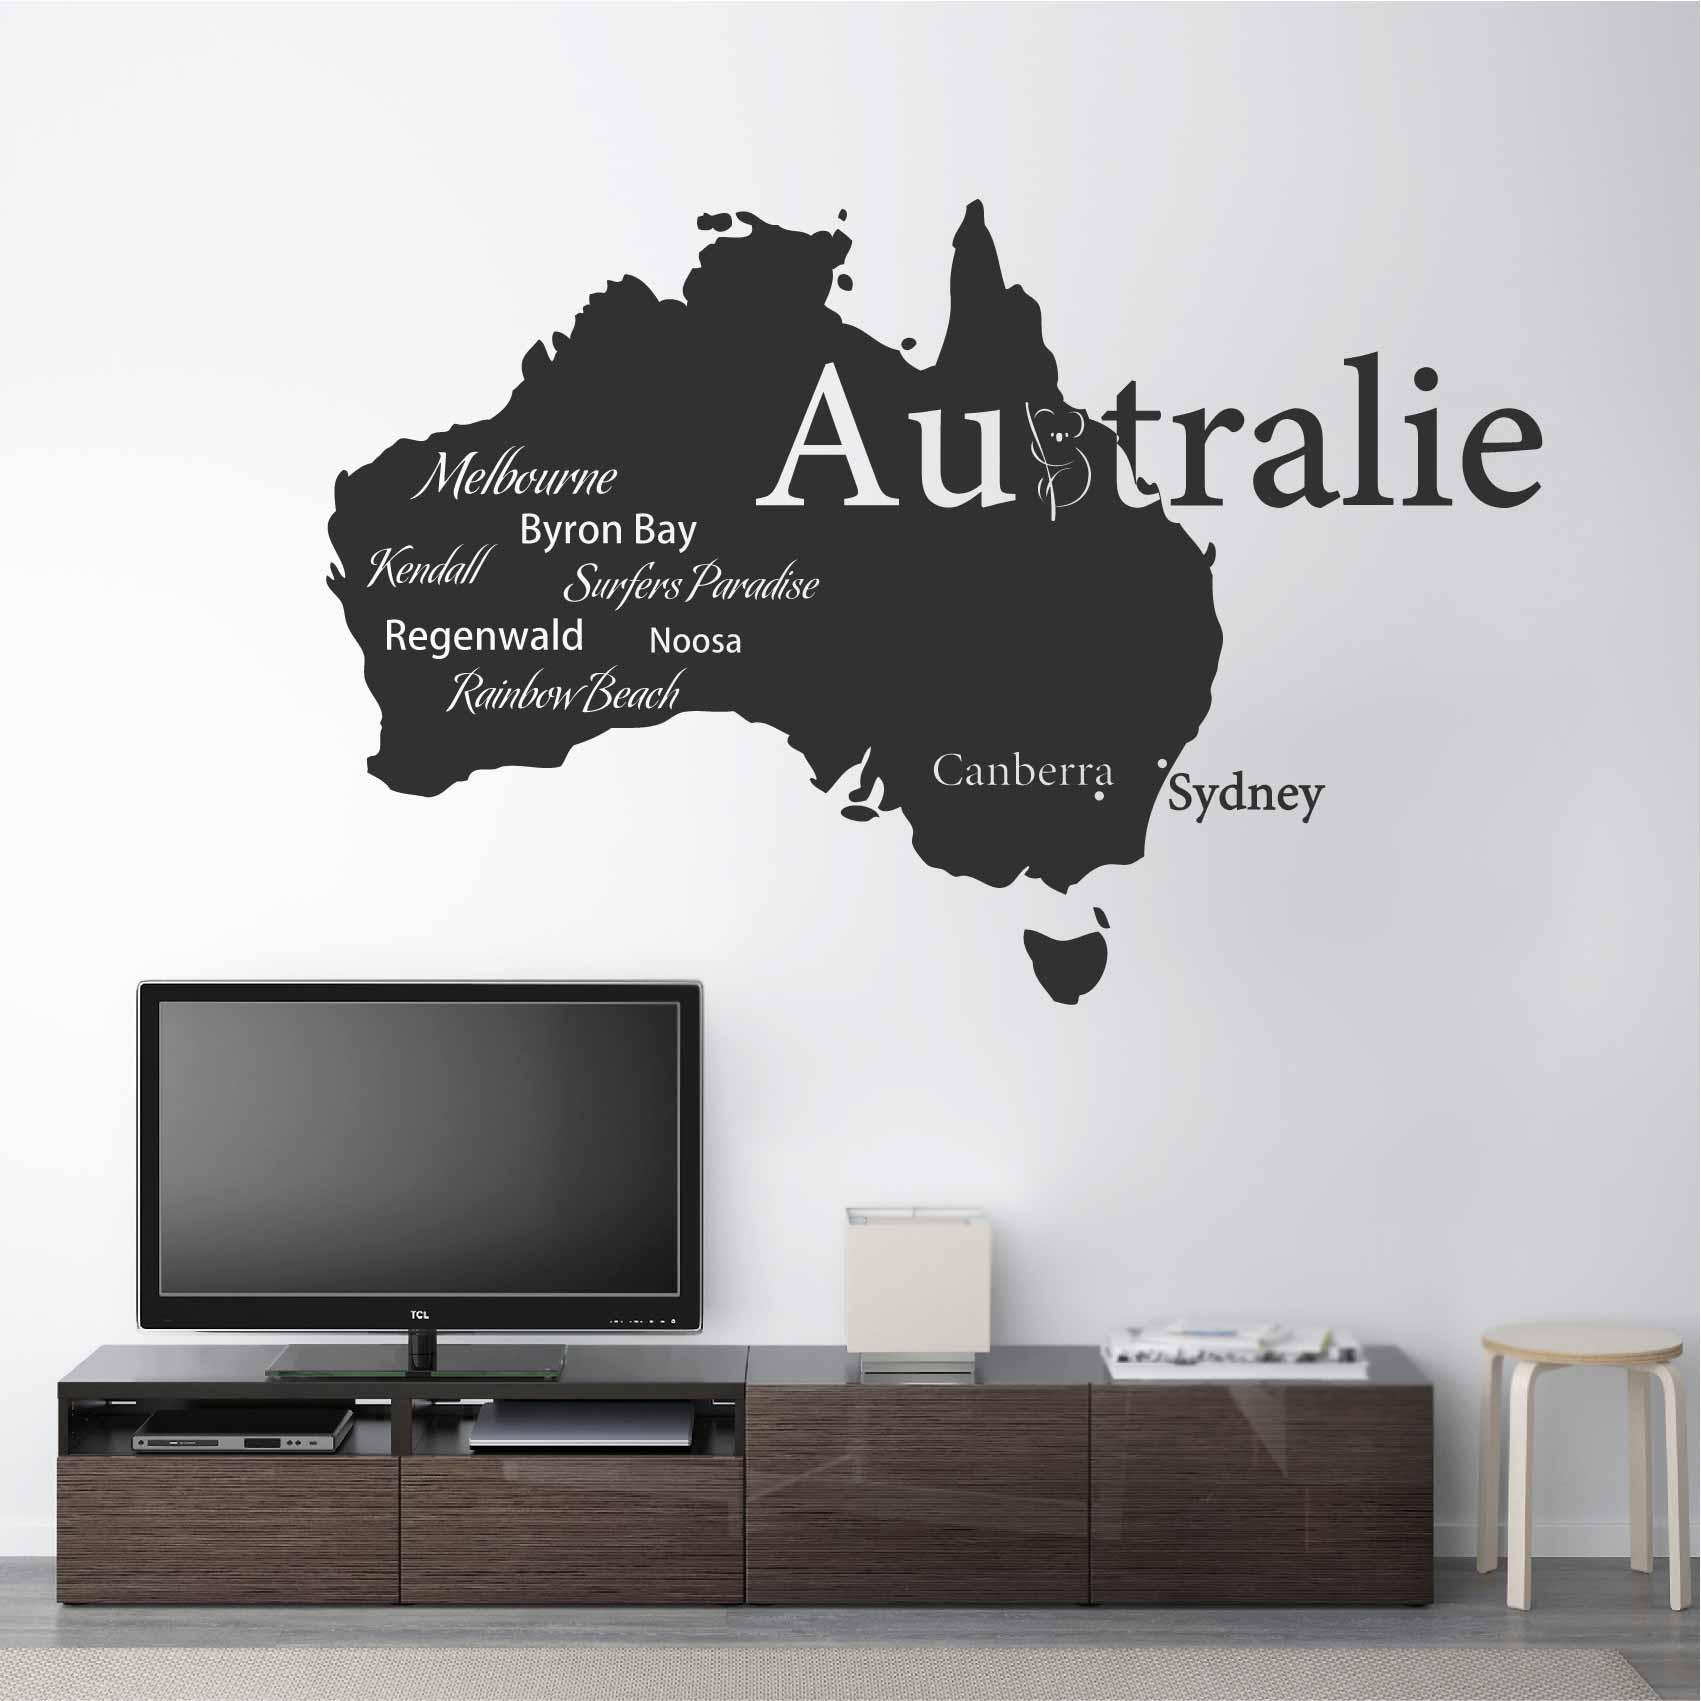 Carte Australie Deco.Stickers Australie Carte